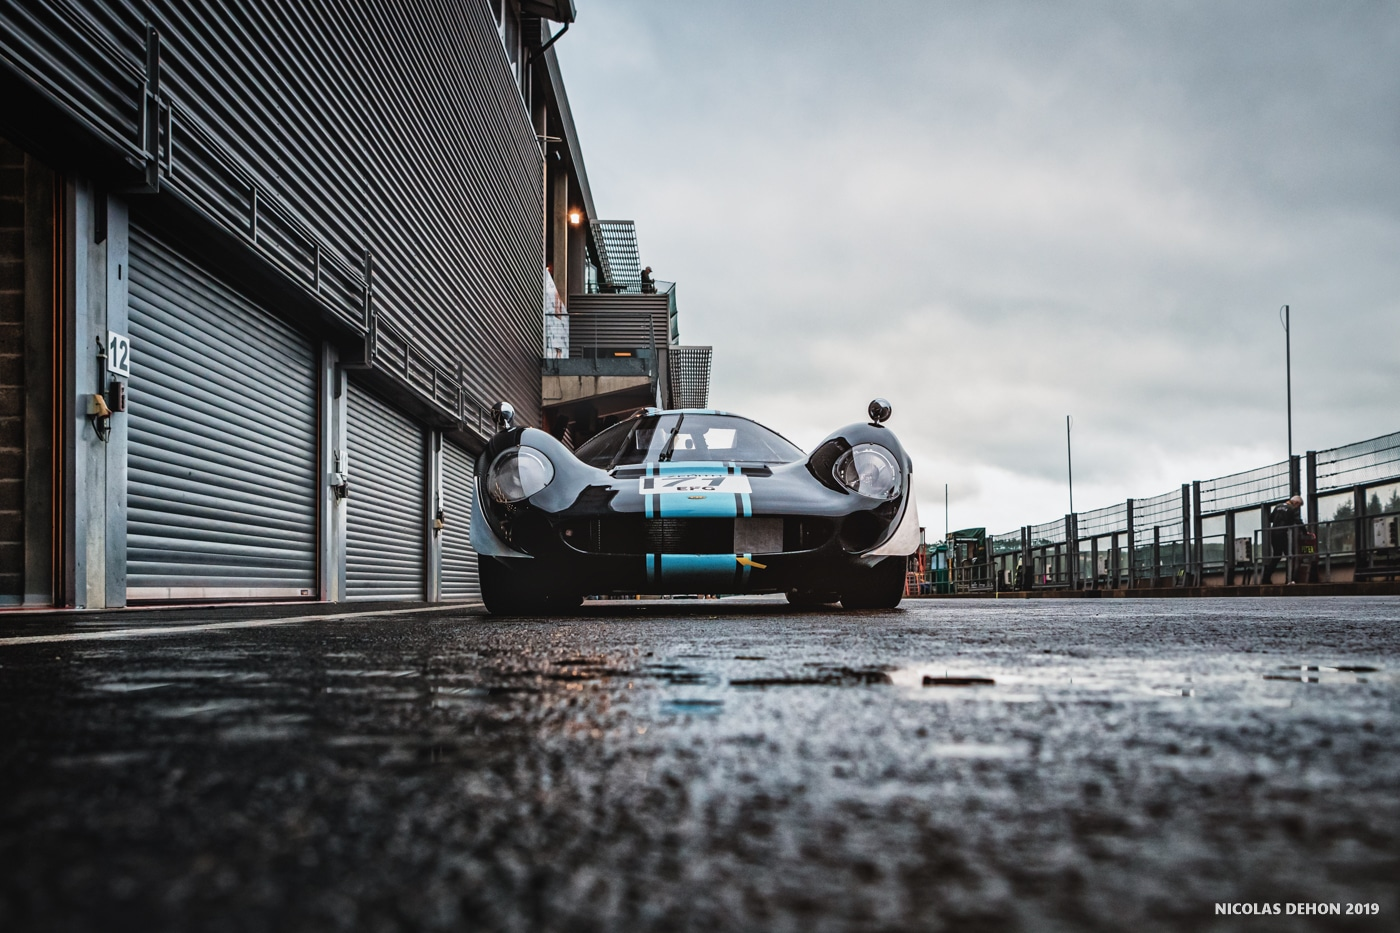 Spa Six Hours 2019 - Lola T70 Mk3 A